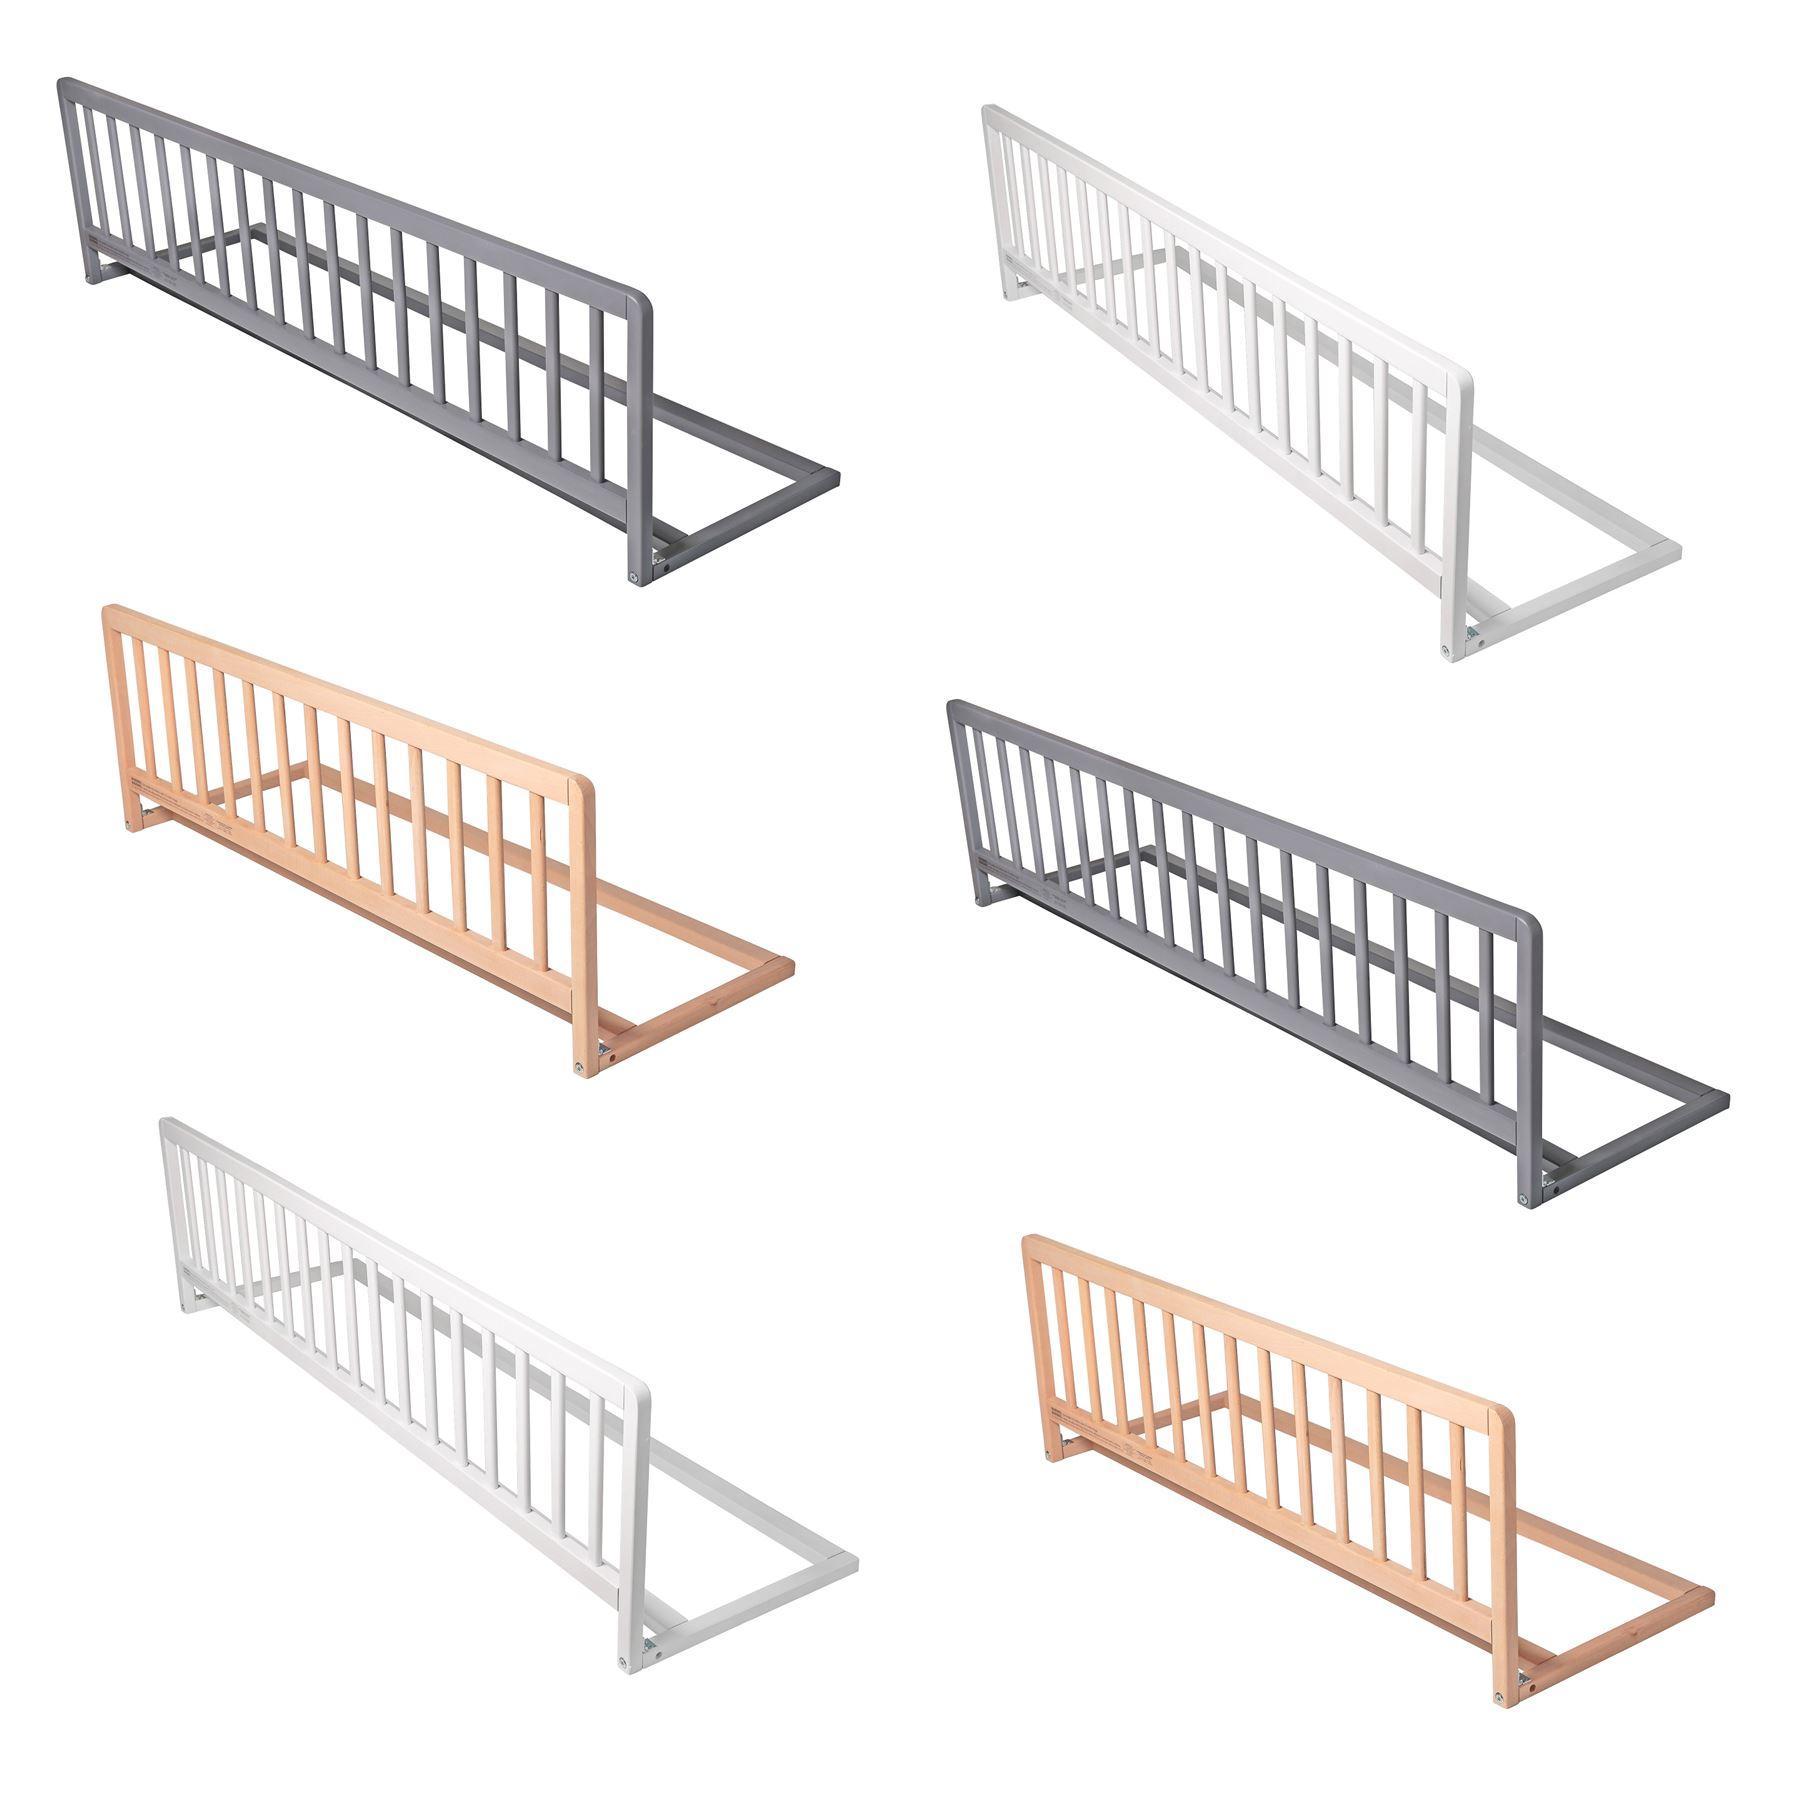 Safetots Premium Wooden Bed Rail Safety Toddler Bed Guard Kids Wood